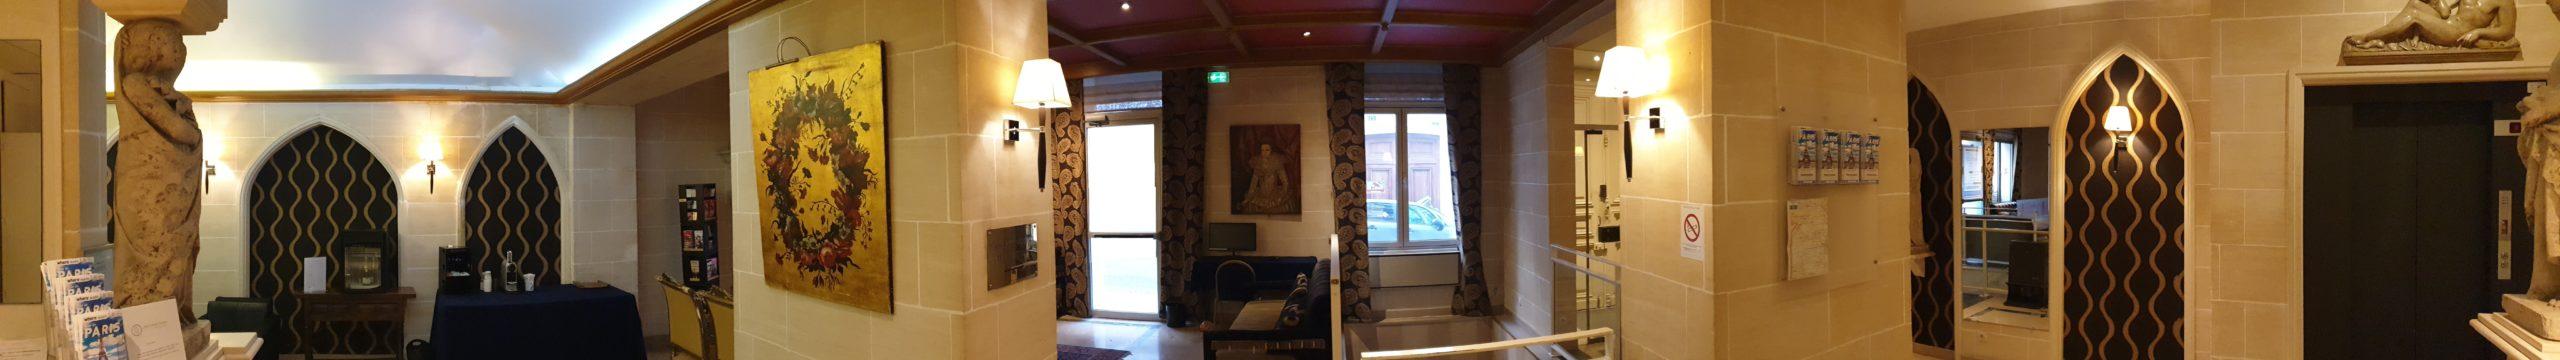 lobby en panorama - hôtel star champs-élysées bis